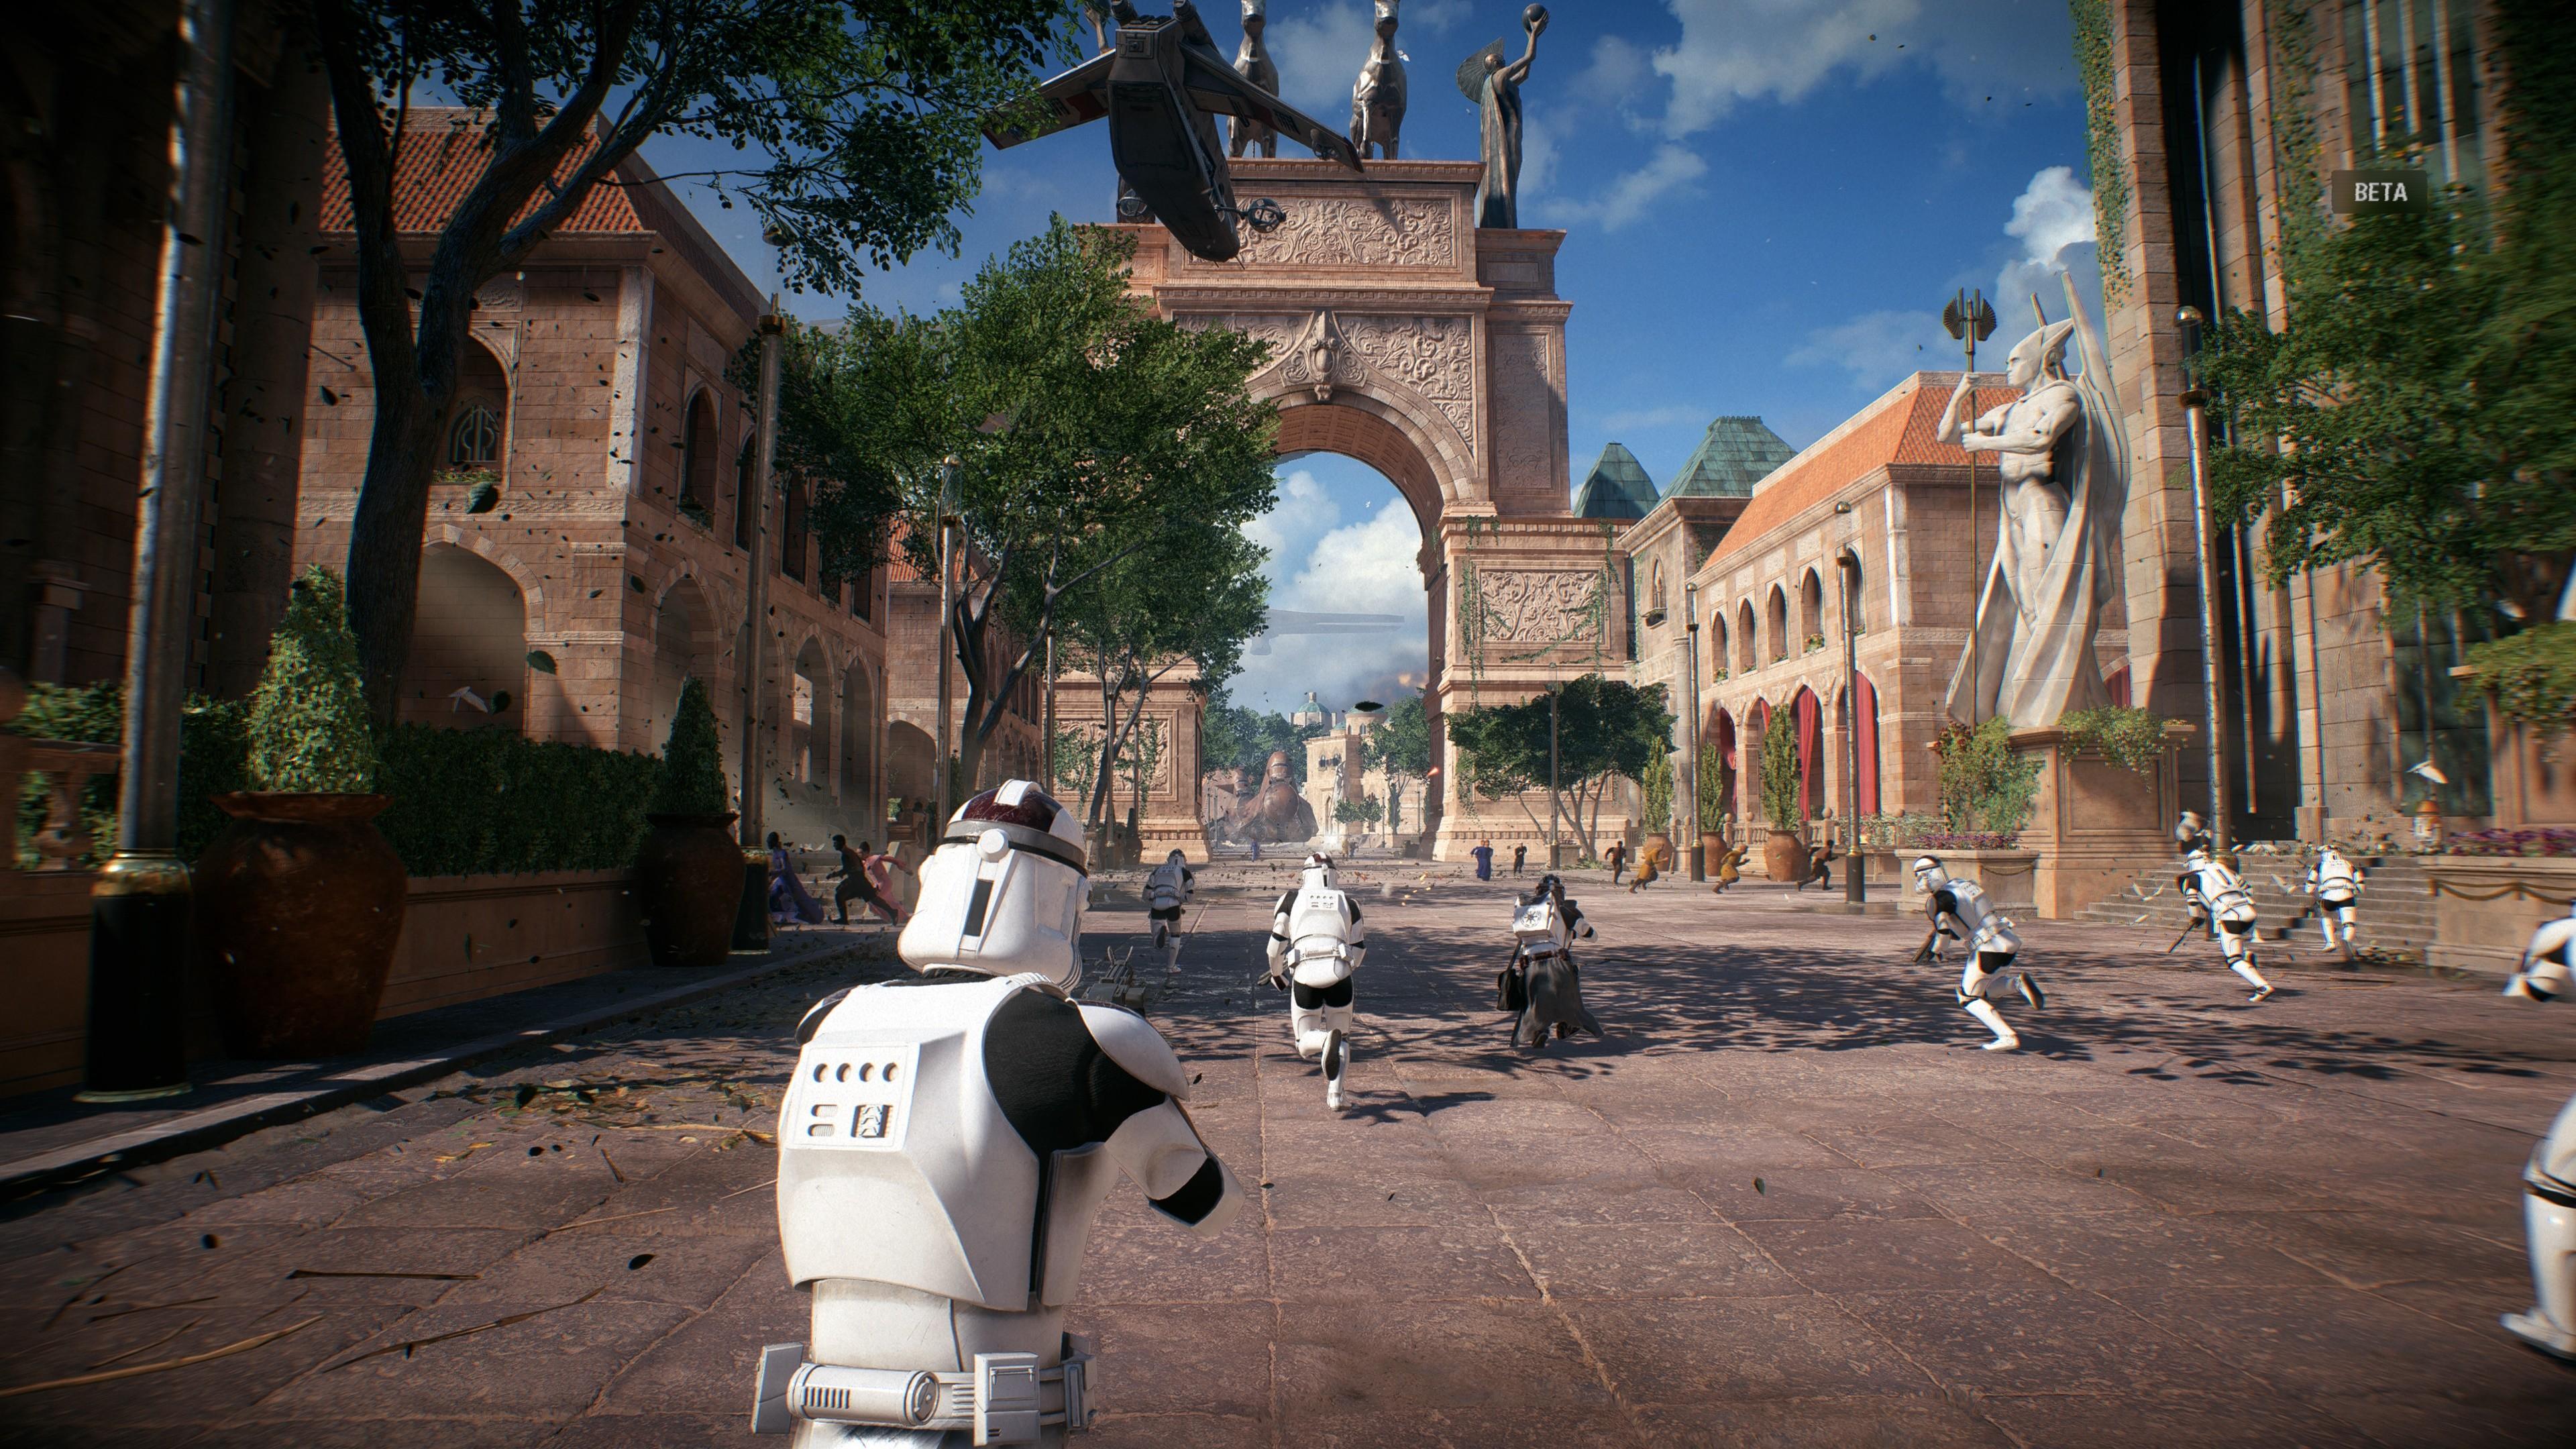 Star Wars: Battlefront 2 (2017) 4K Beta - Star Wars: Battlefront 2 (2017) 4K